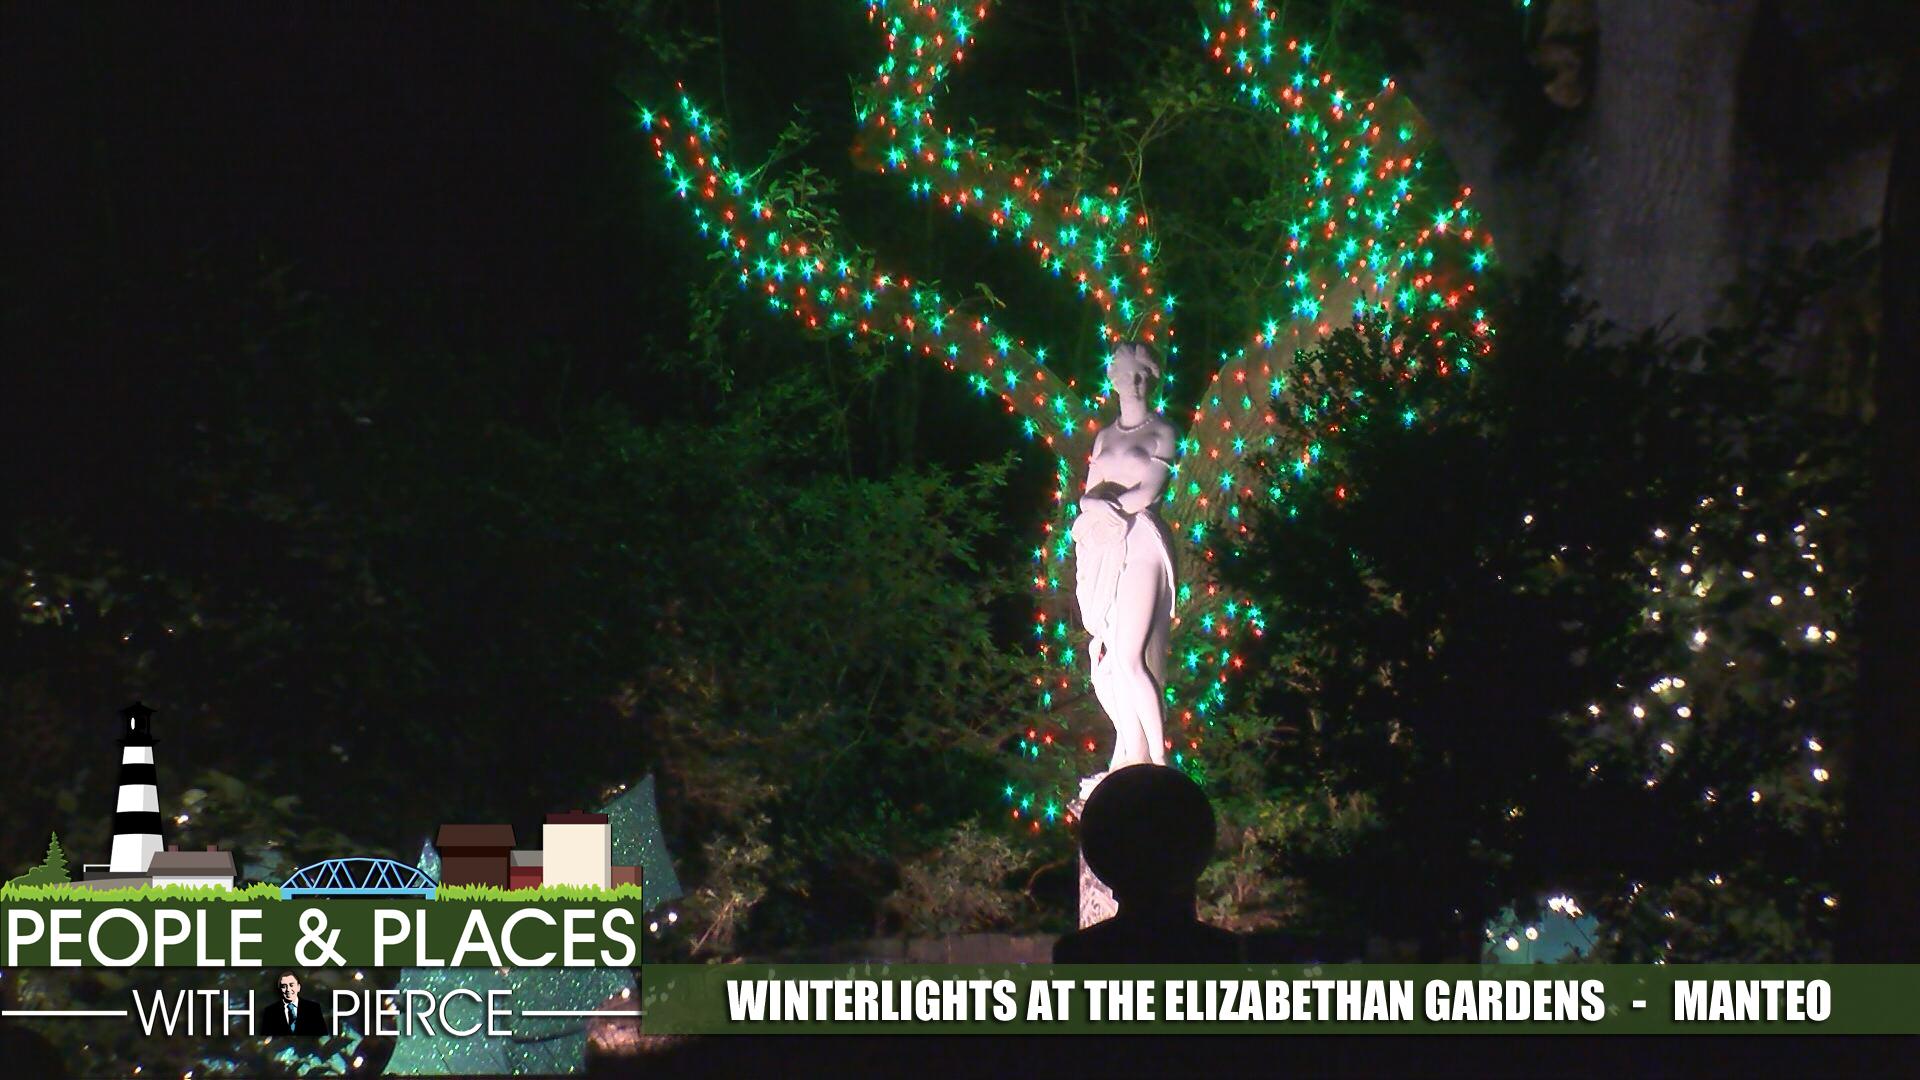 elizabethan-gardens-winterlights-for-web_320652